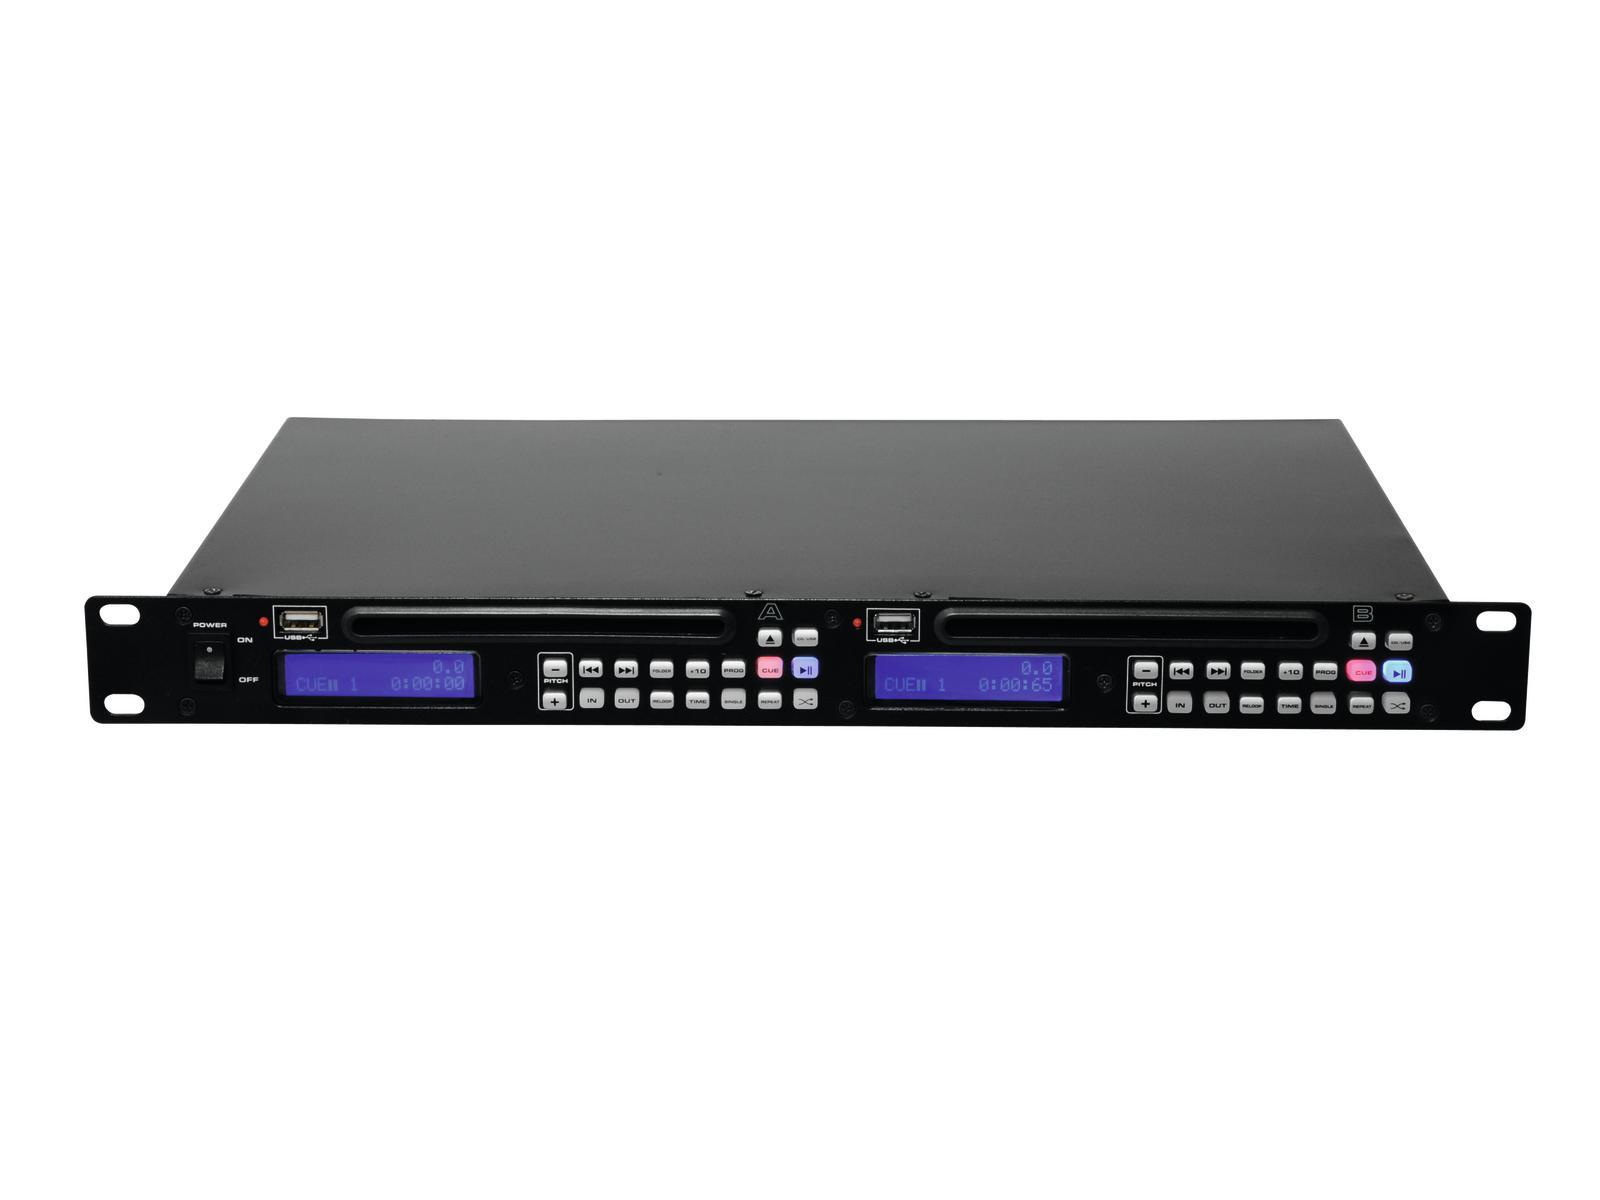 omnitronic-dmp-202-dual-usb-cd-player